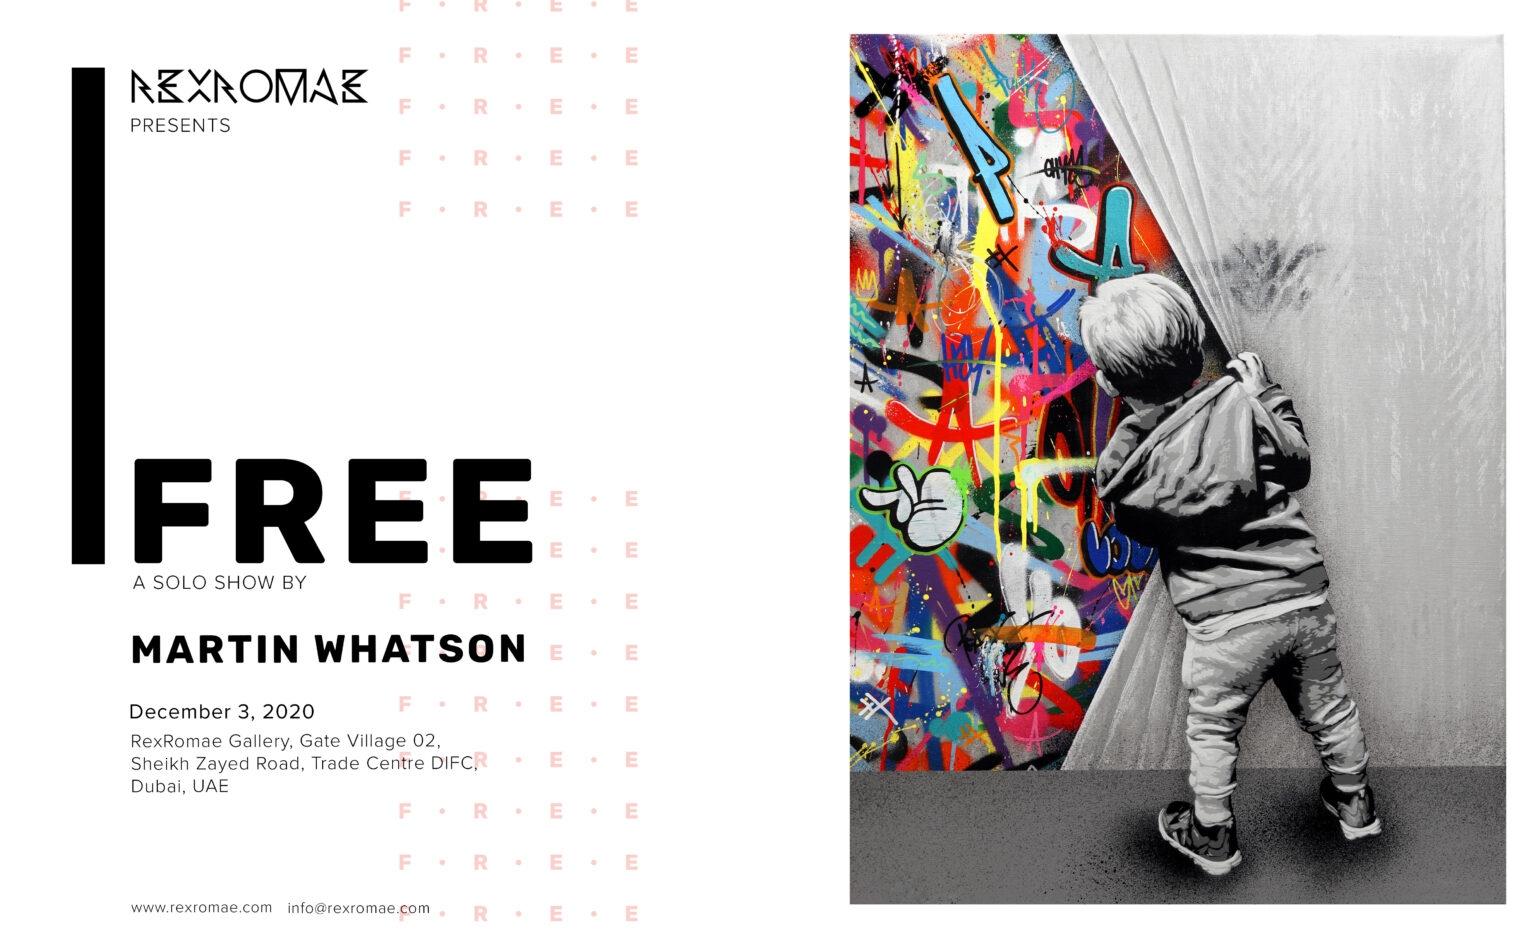 "Martin Whatson ""Free"" Solo Exhibition at Dubai's RexRomae Gallery"